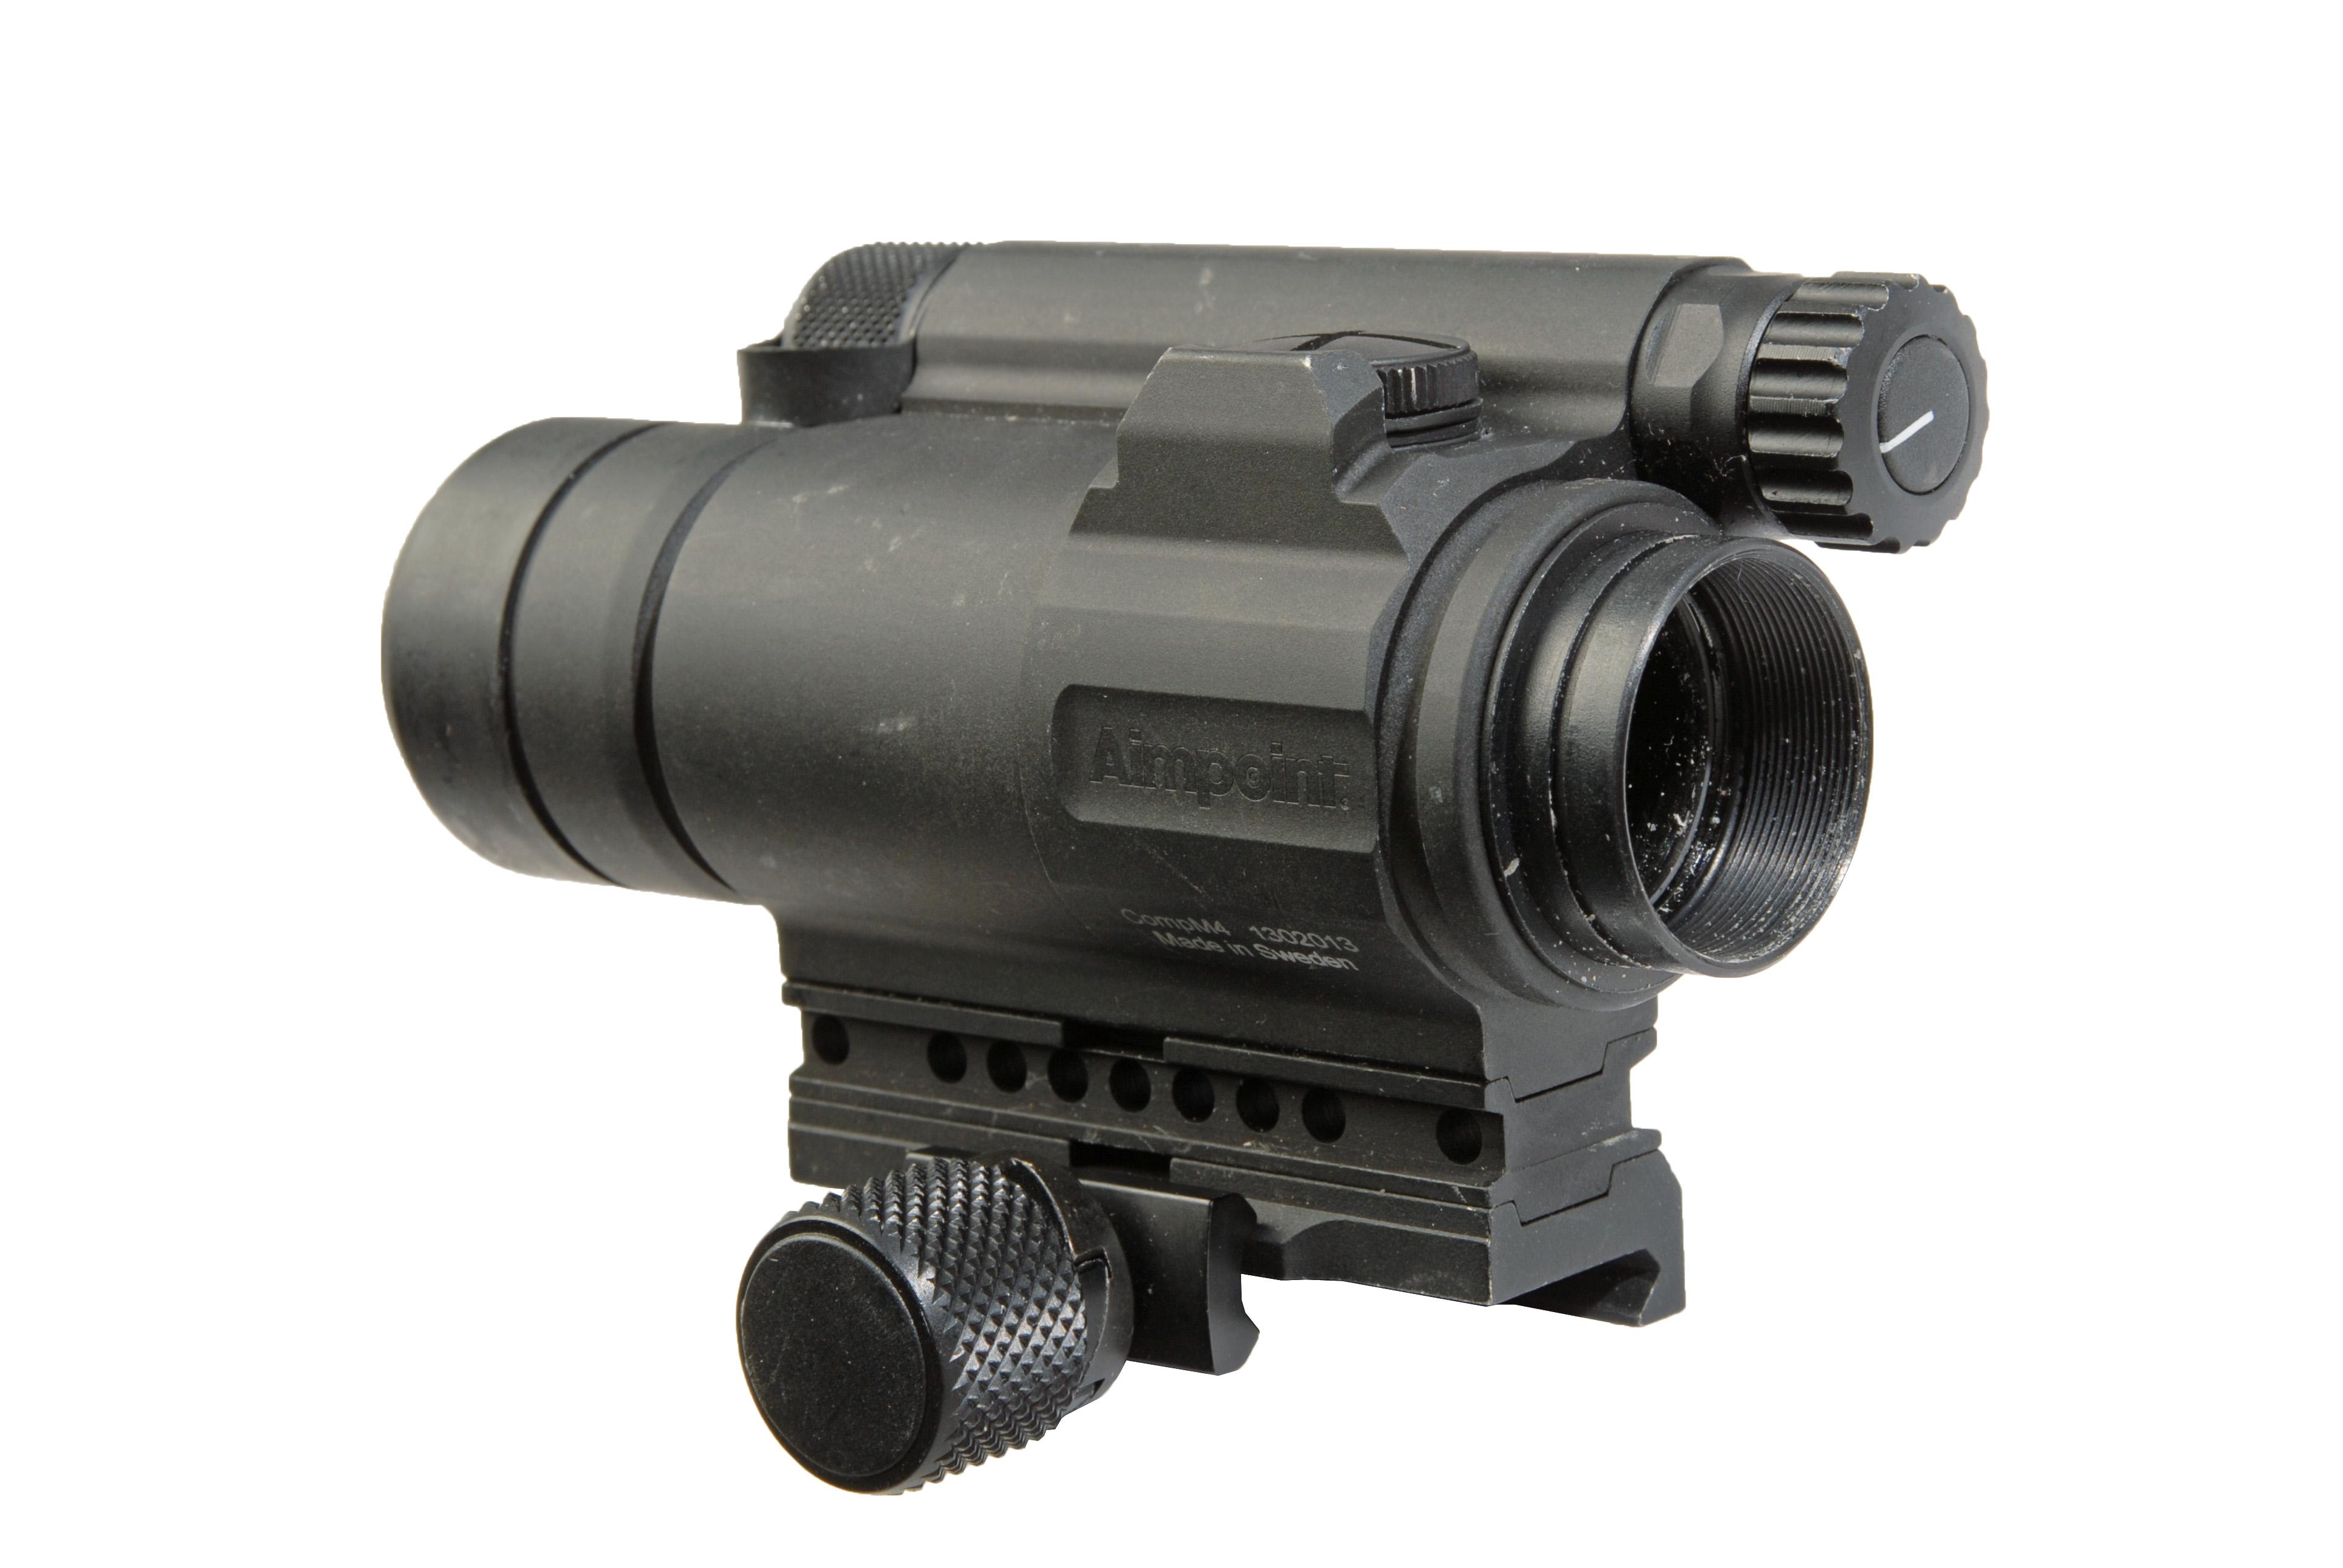 sight reflex collim m68 comp m4